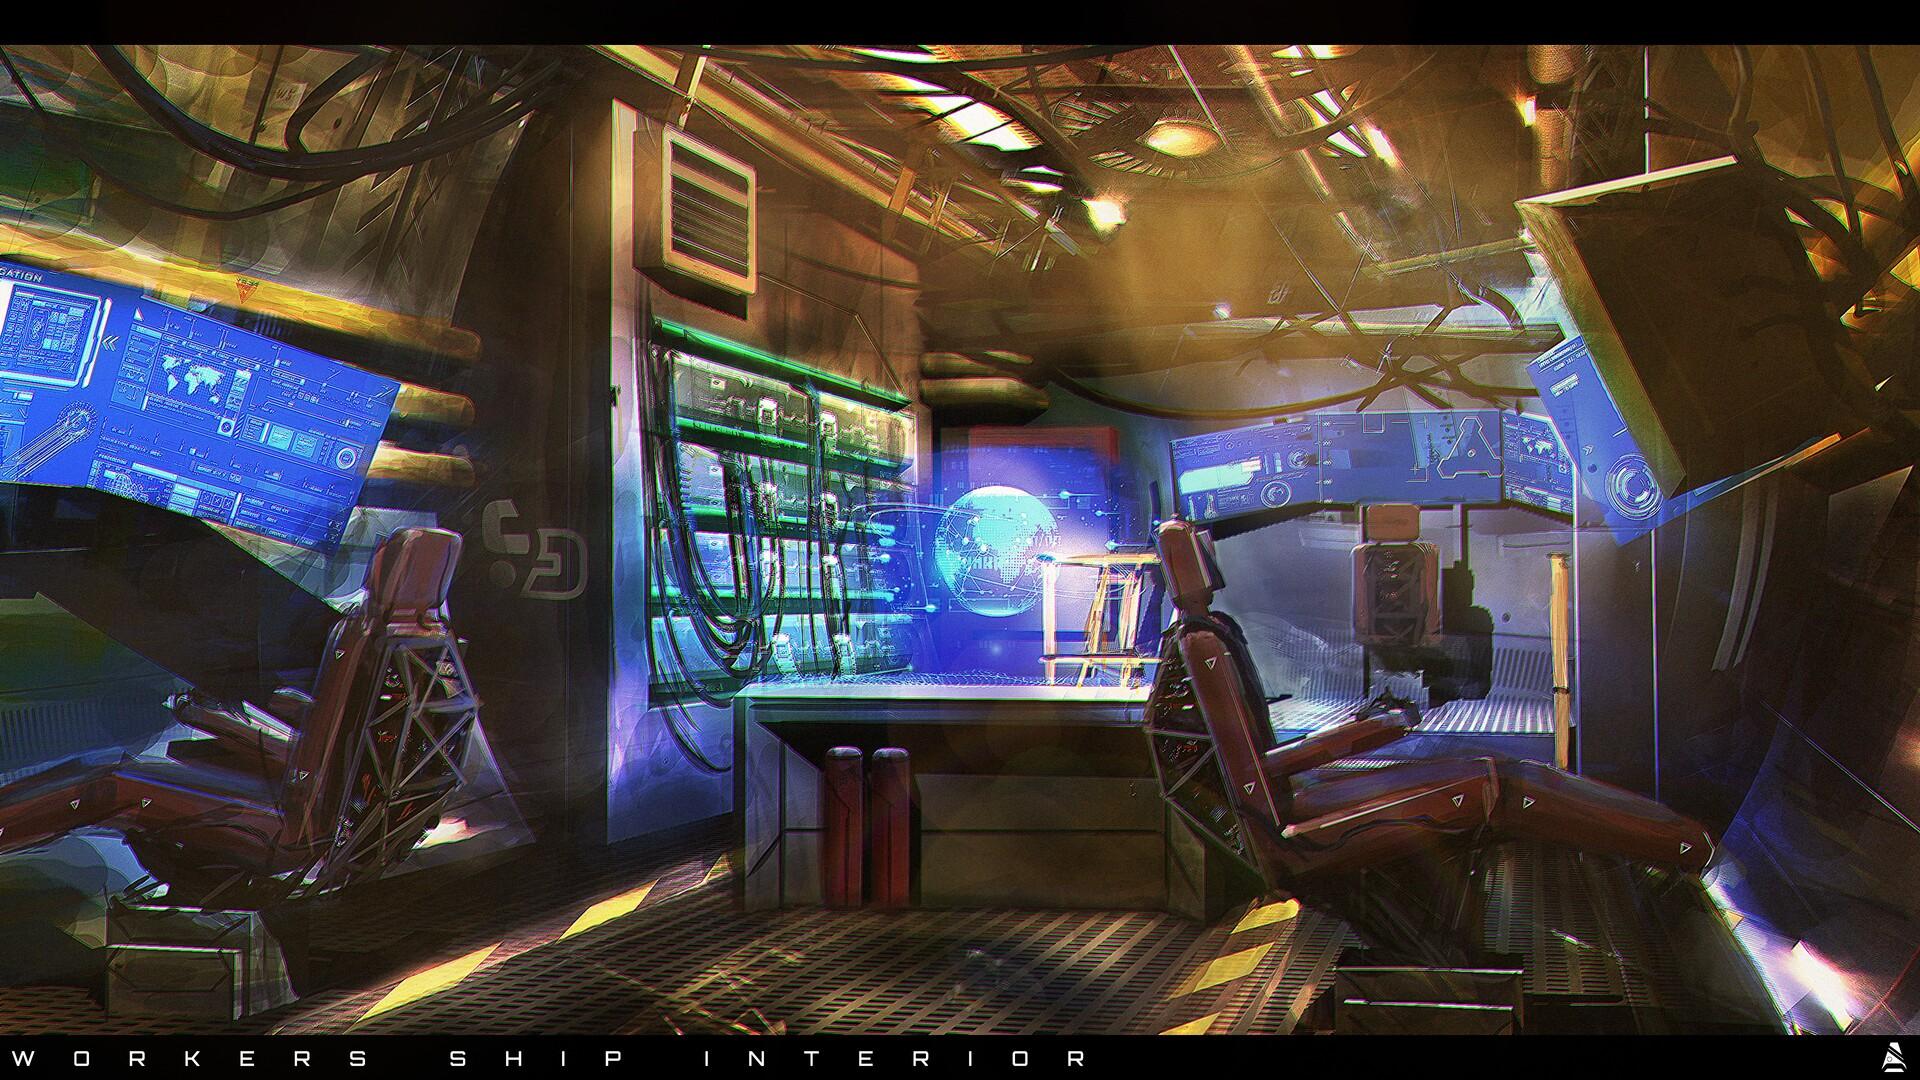 aegis-falcon-worker-ship-interior-smaller.jpg